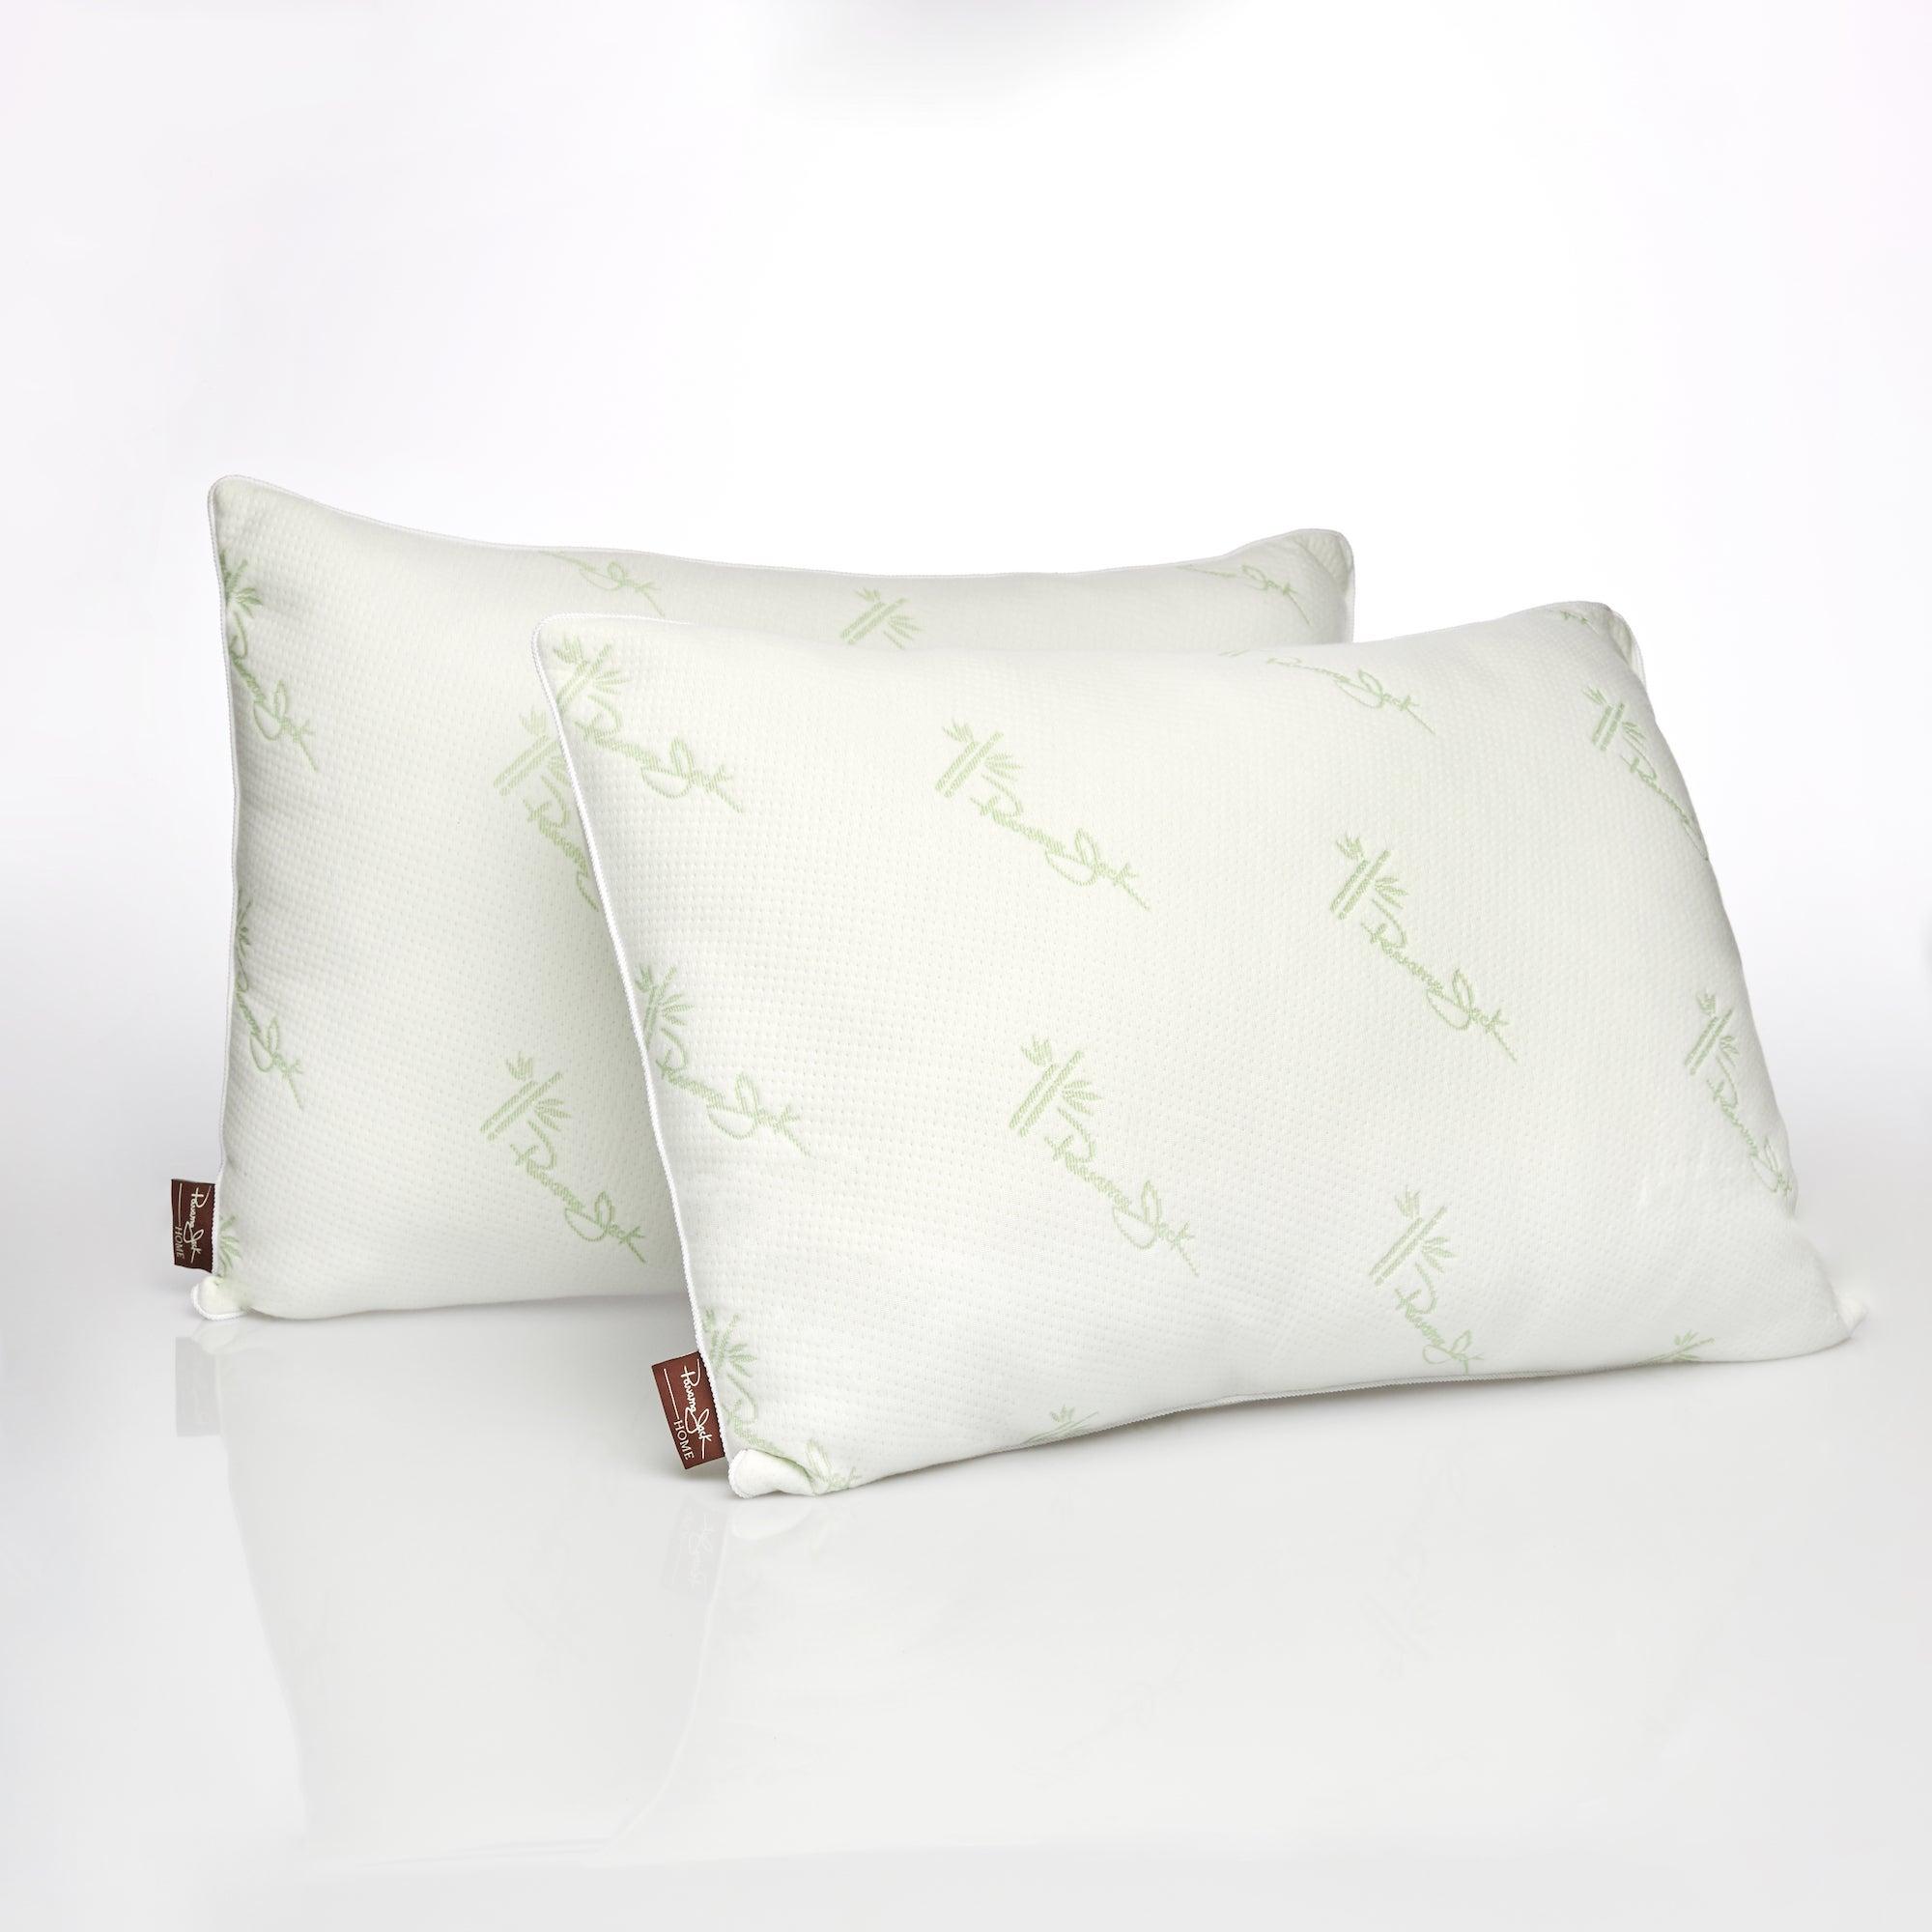 pillow reviews polyfoam comfort majestic memory products primo foam pillows mttrss antibacterial international bamboo